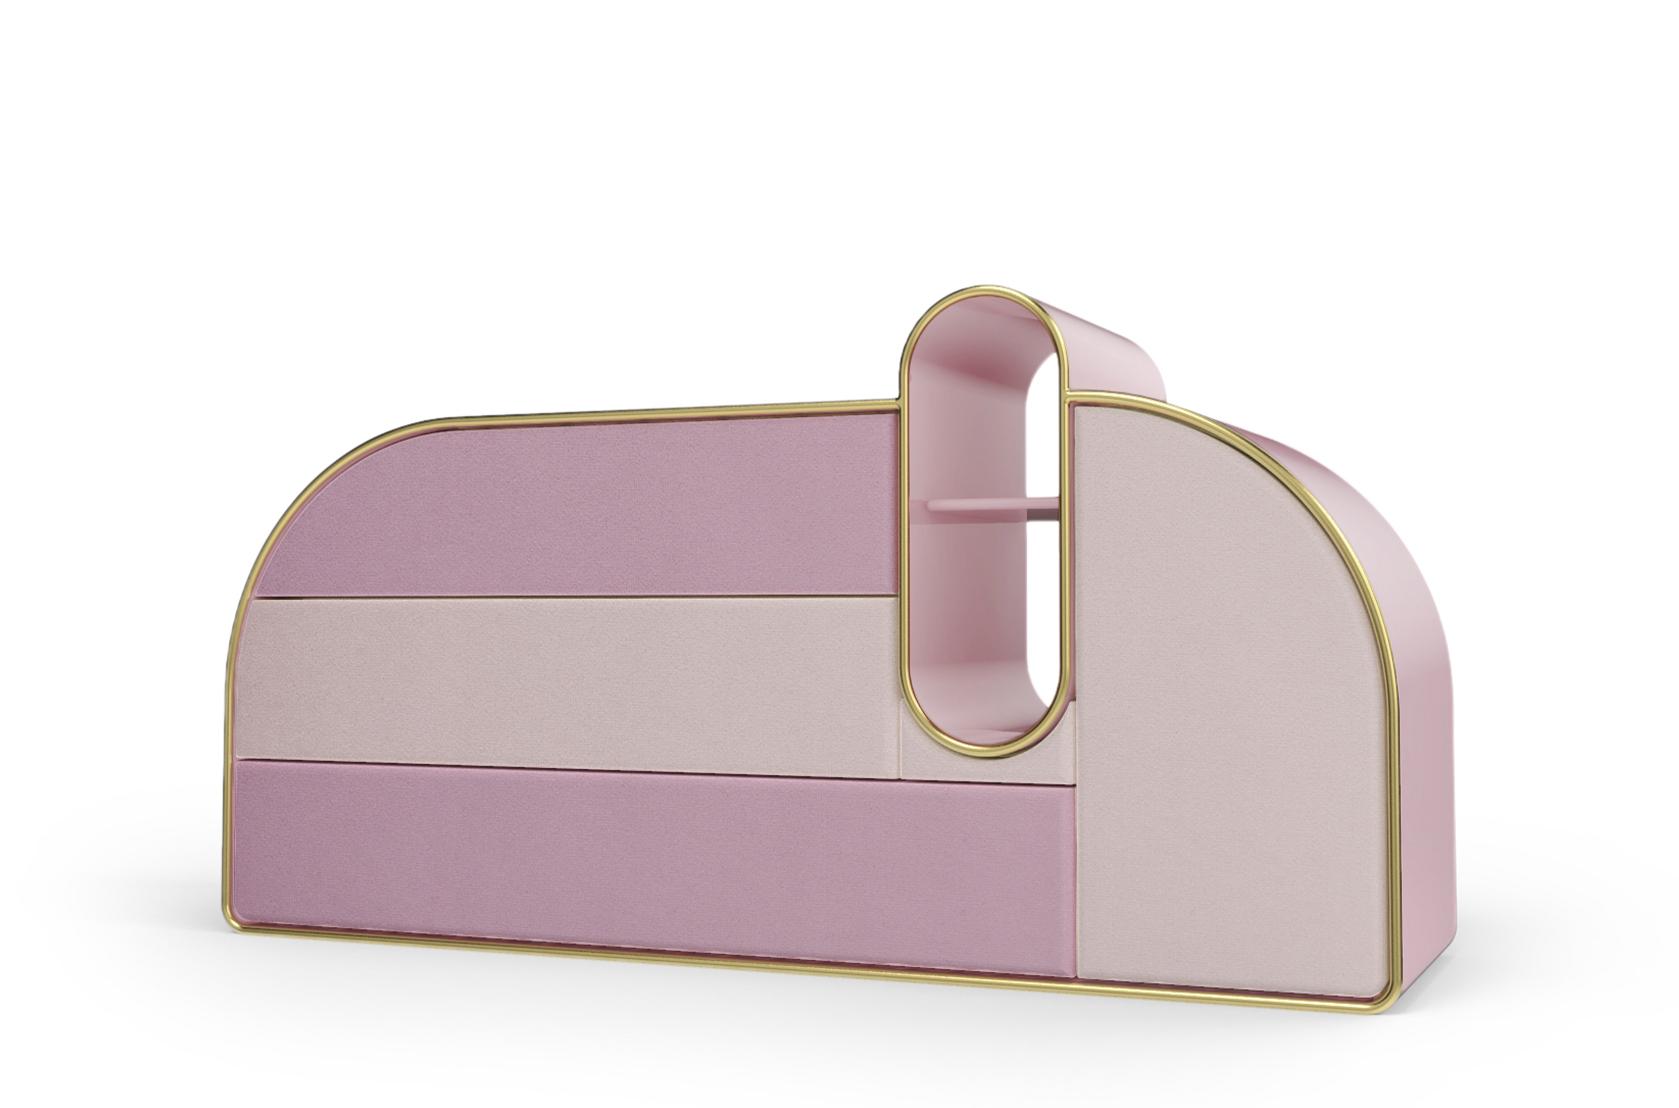 Cofres lujuosos: ideas para poner en un hogar moderno y poderoso cofres lujuosos Cofres lujuosos: ideas para poner en un hogar moderno y poderoso bubble gum chest 3 drawers circu magical furniture 2